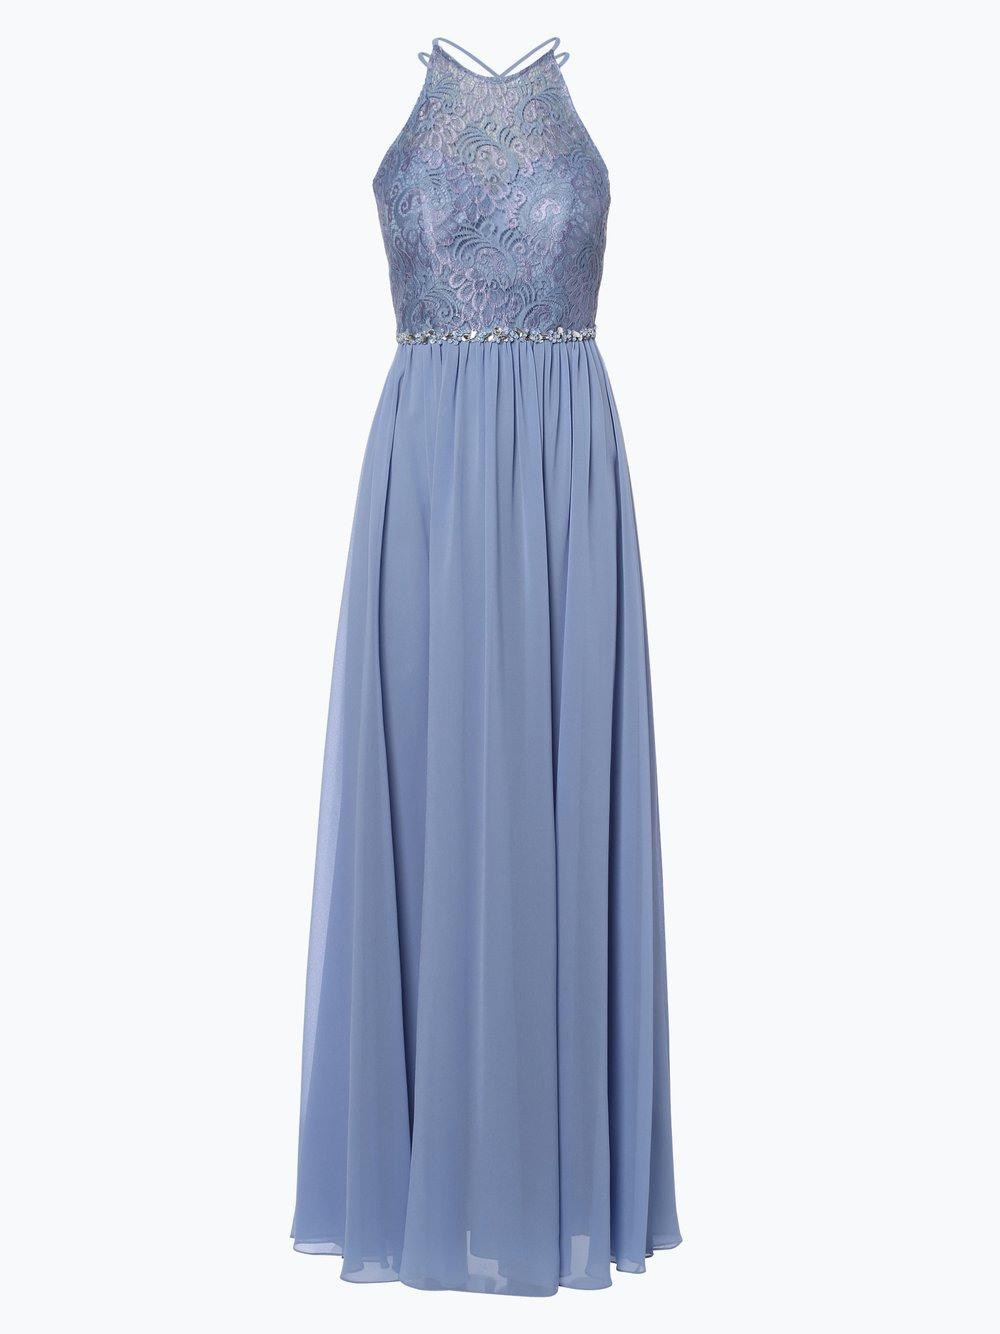 17 Schön Abendkleid Hellblau Lang GalerieAbend Großartig Abendkleid Hellblau Lang Bester Preis